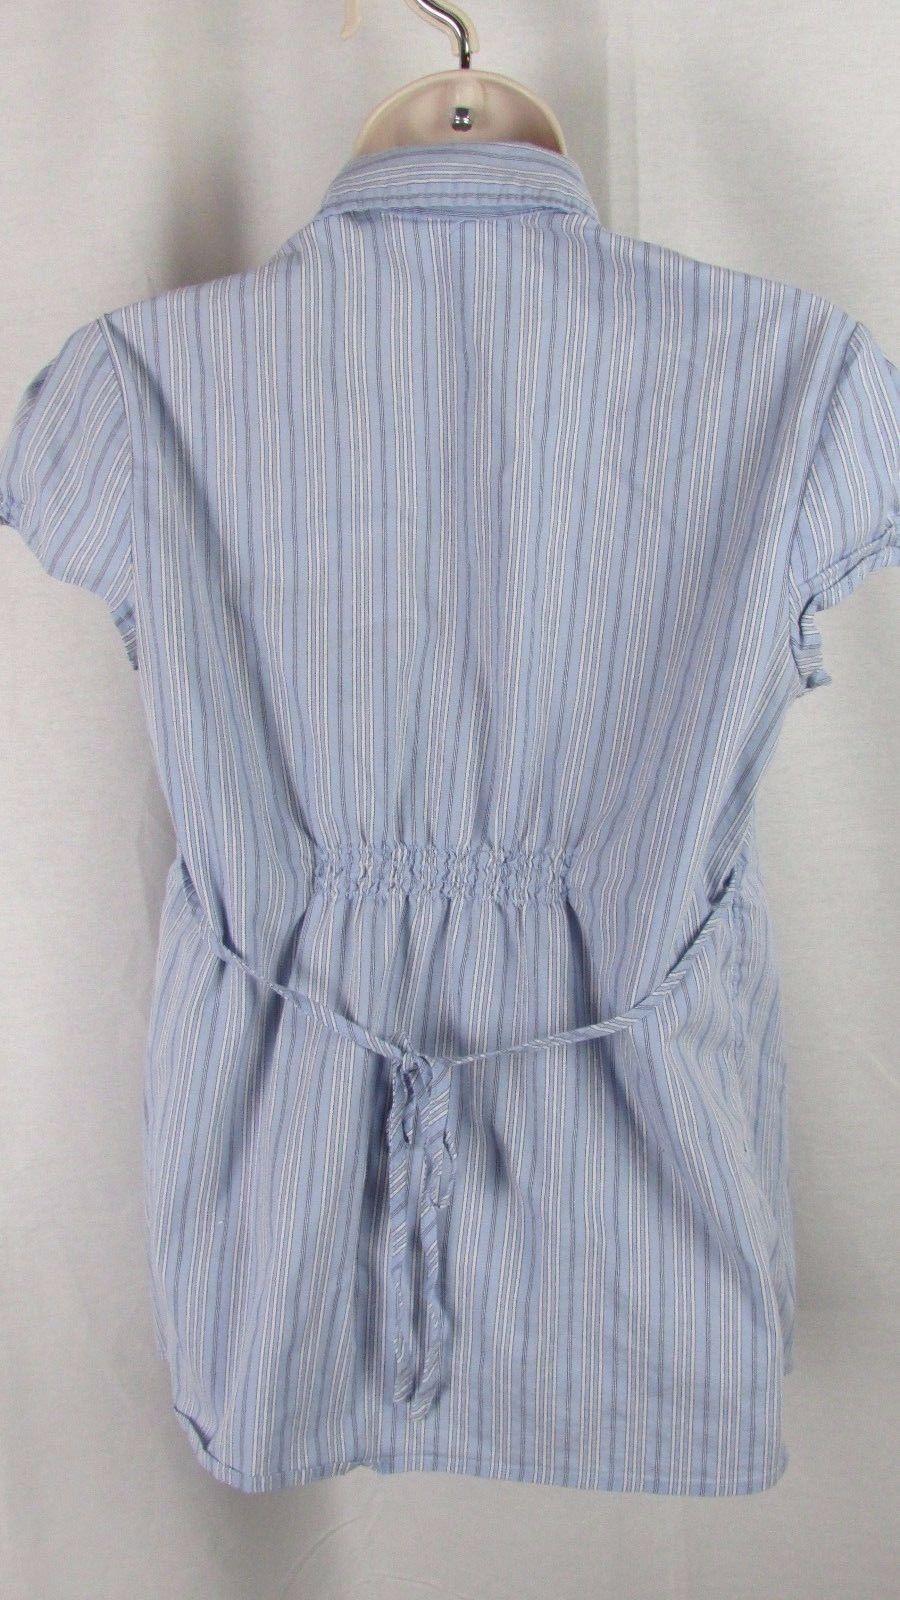 fa7483ac4b569 Motherhood Maternity Small blue stripe short sleeve top blouse button down  woven